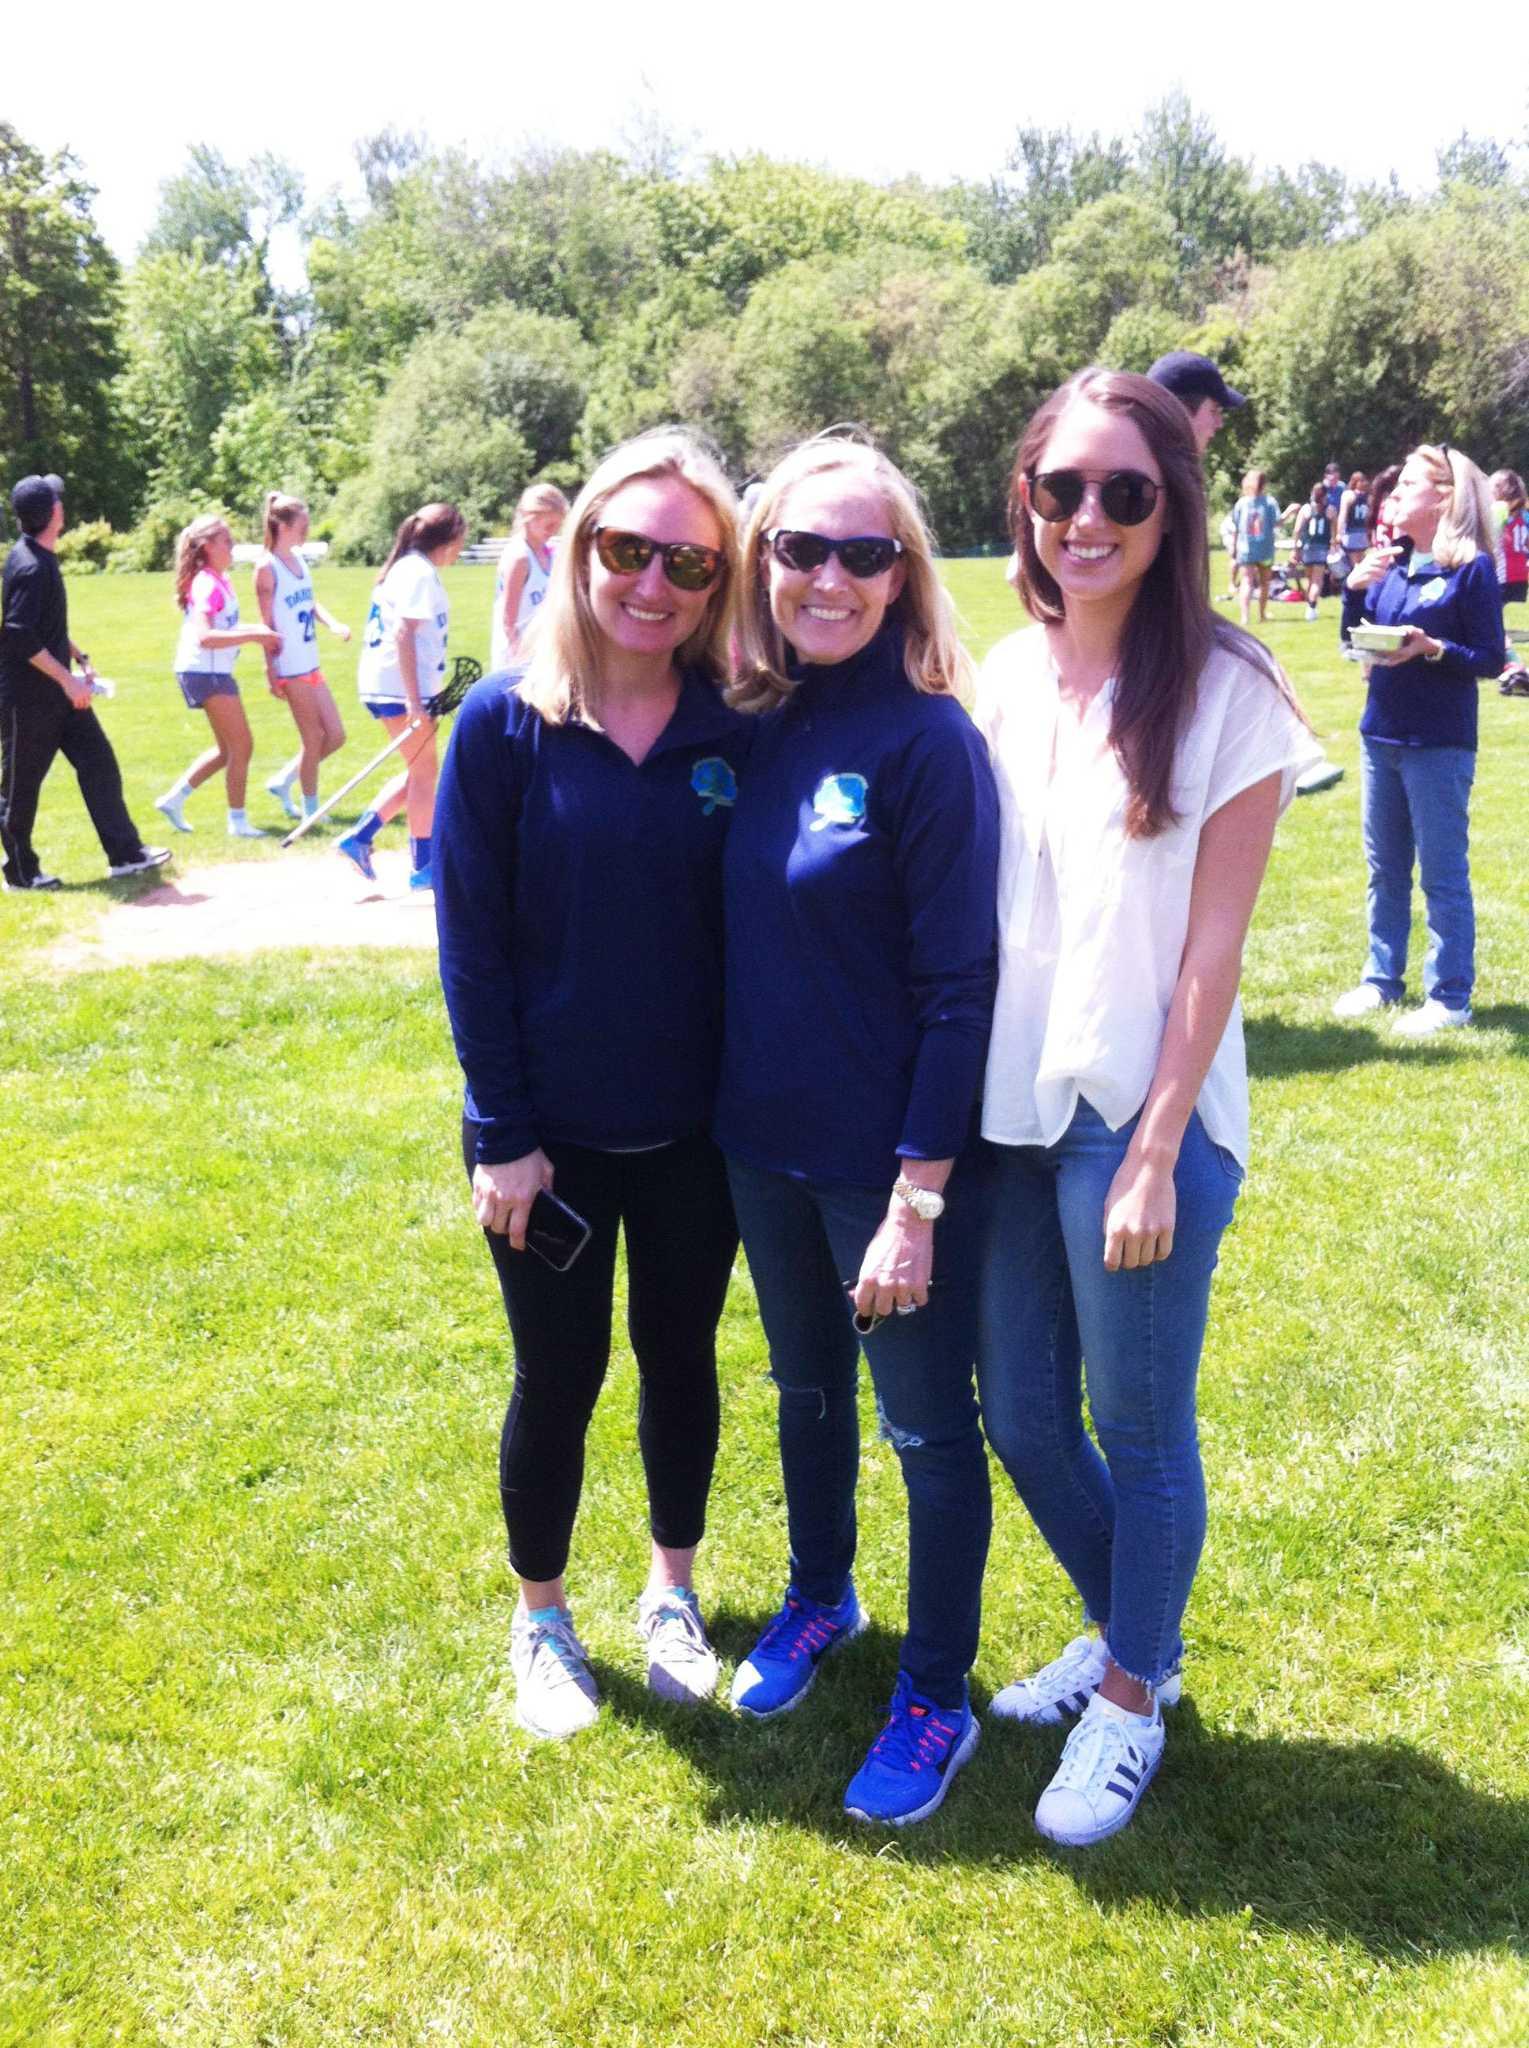 Katie Cassidy Higgins Tournament celebrates 15th anniversary